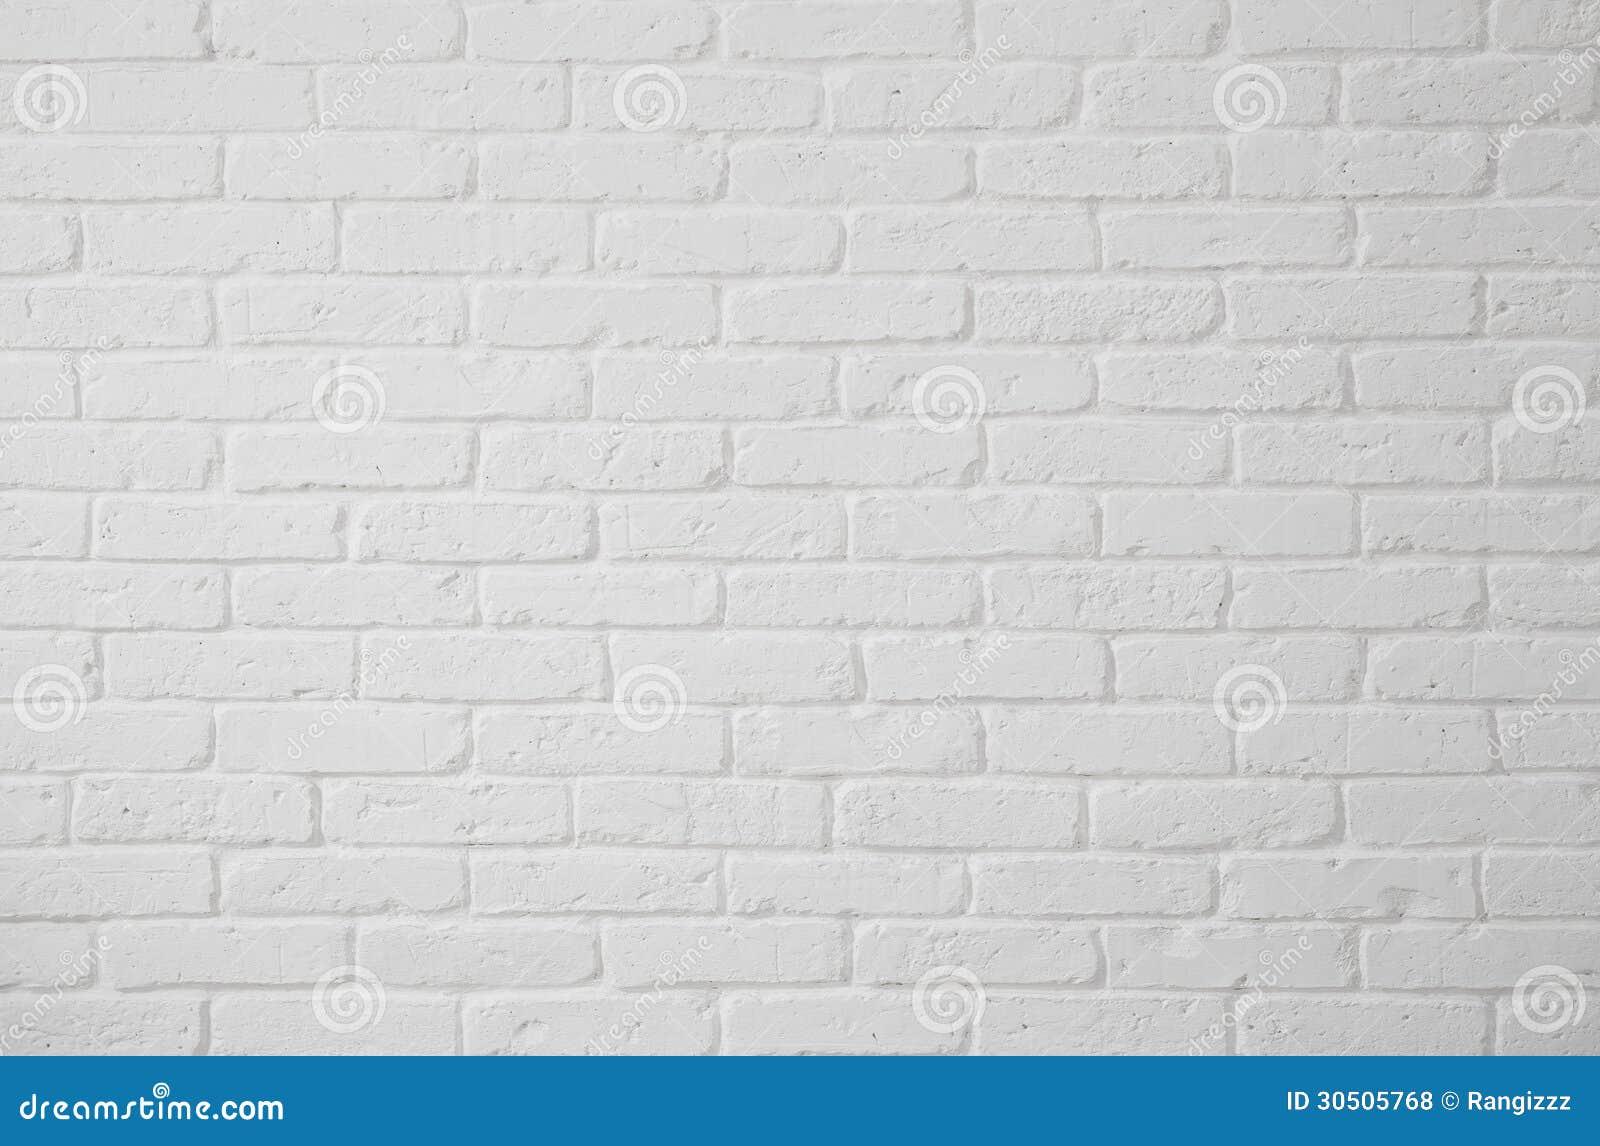 Blank White Brick Wall